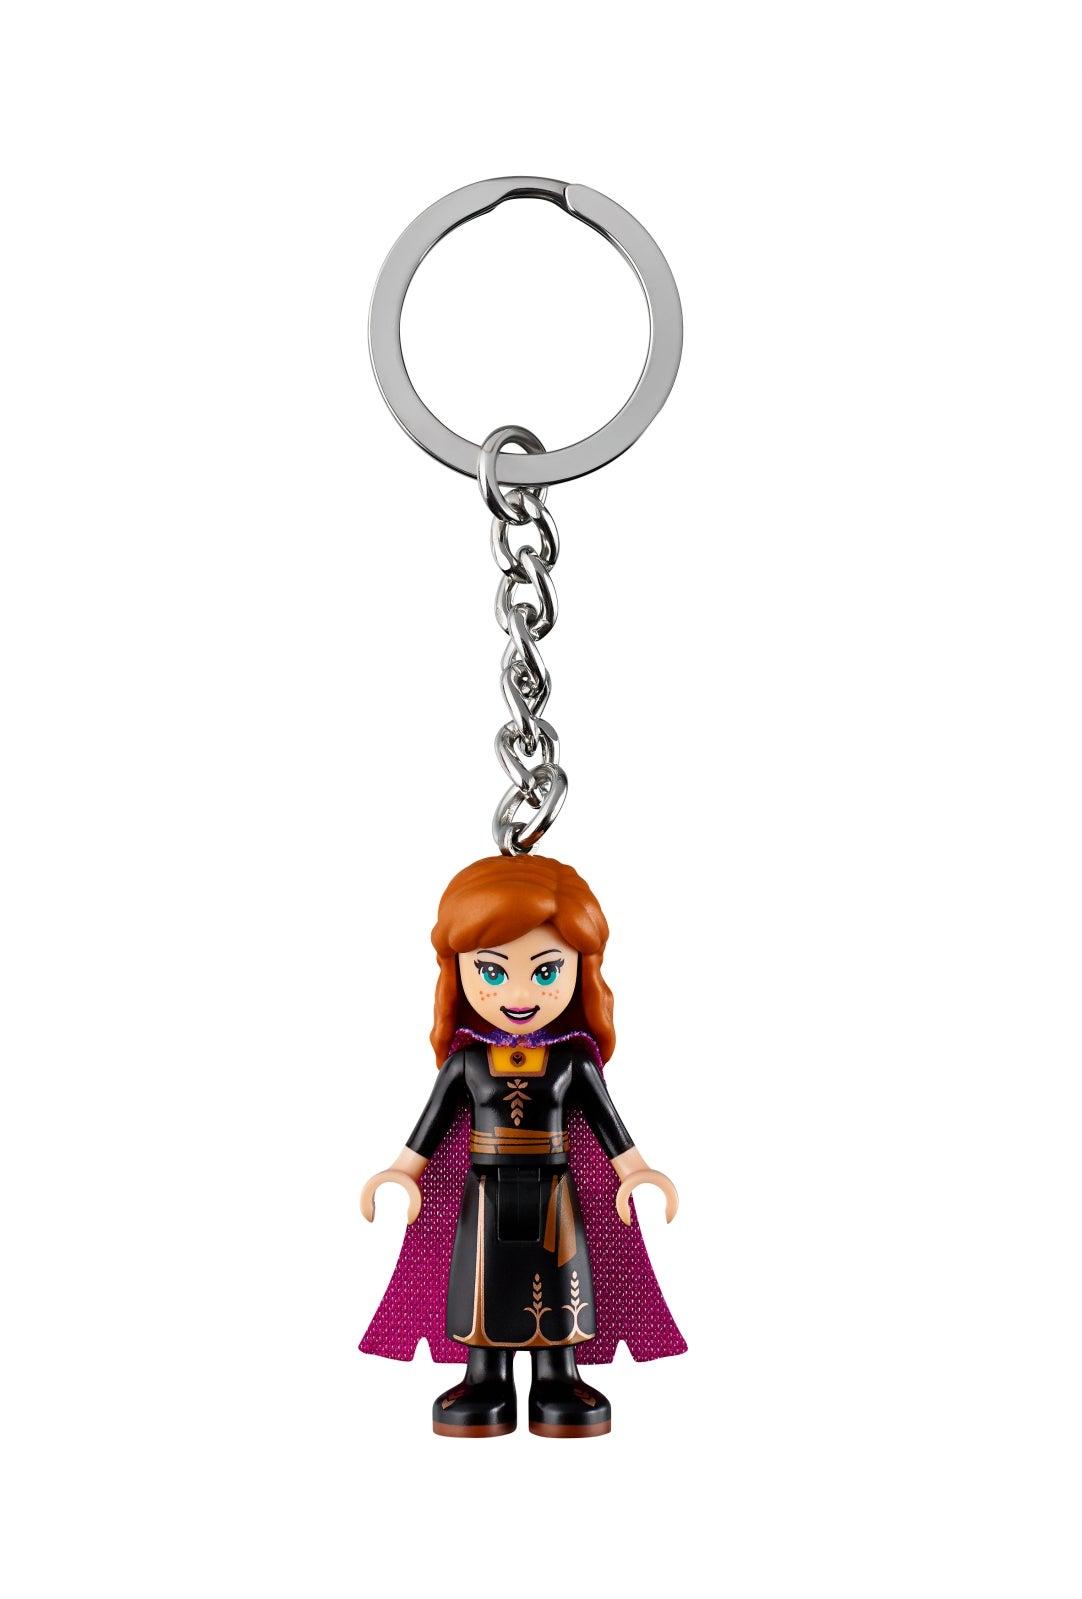 Disney Frozen Eiskönigin LED Schlüsselanhänger Elsa 8cm keychain doll Princess